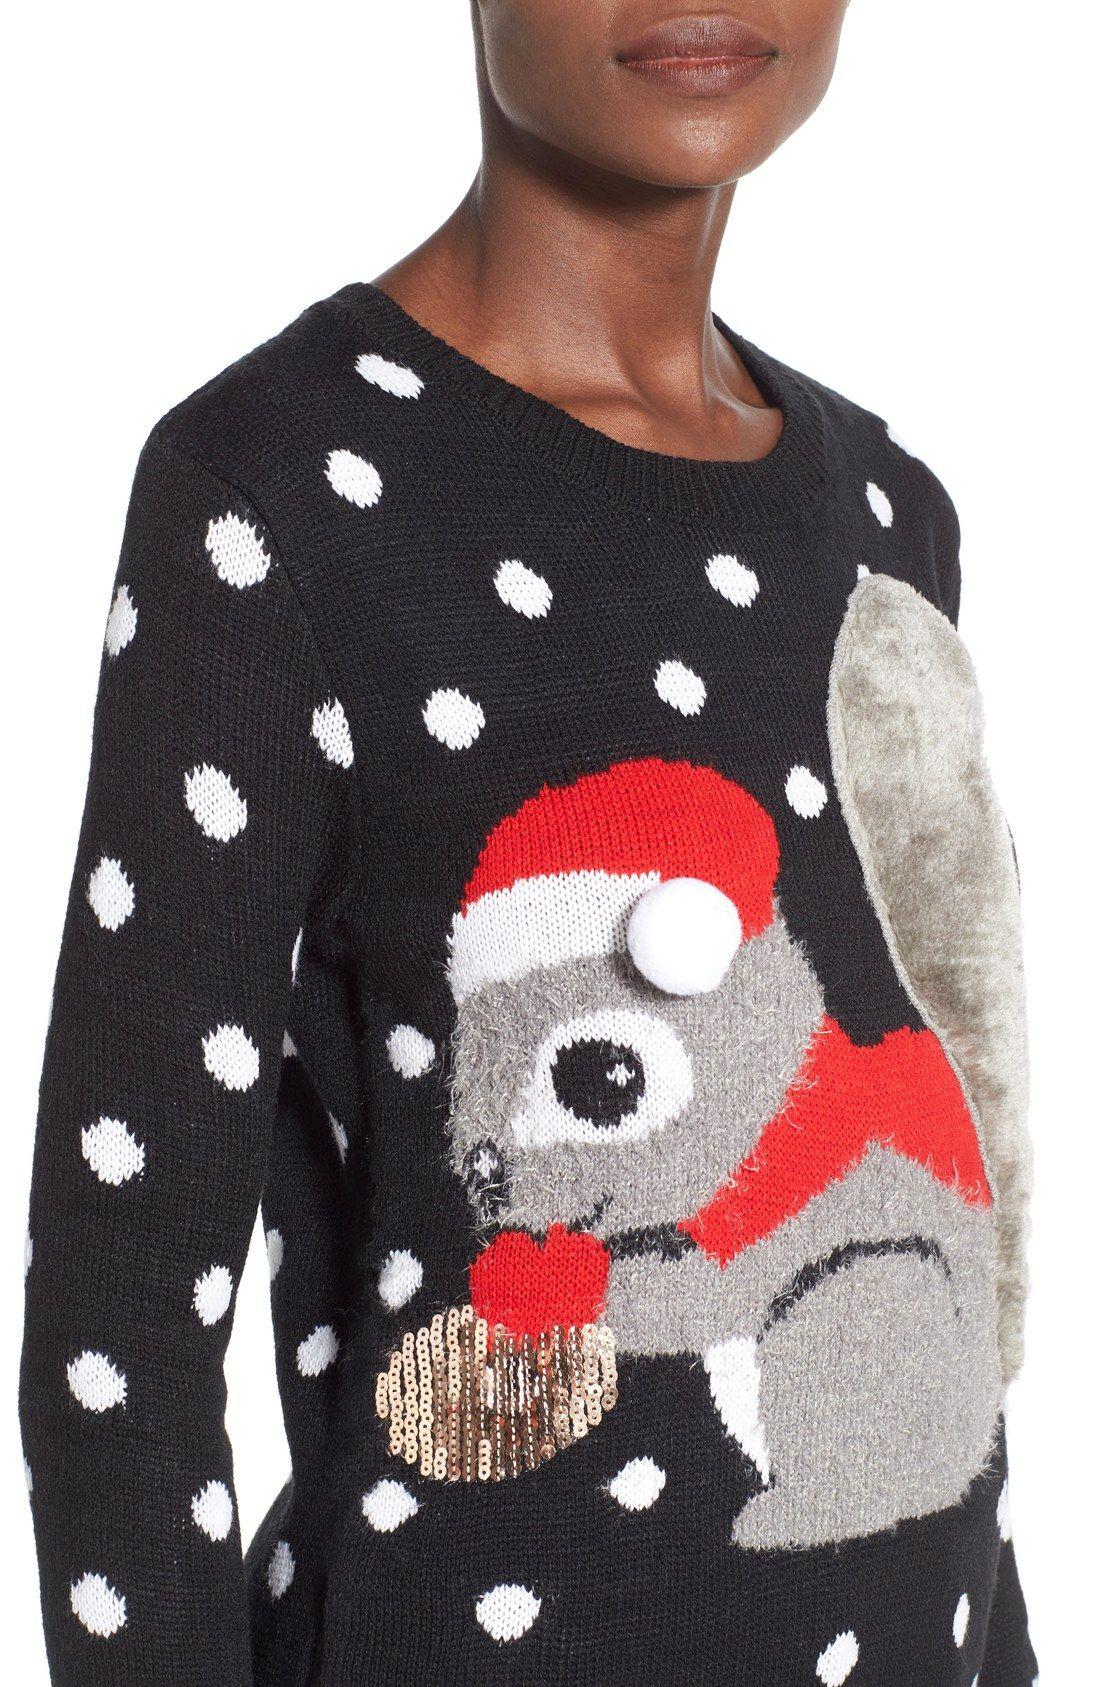 Darling Squirrel Christmas Sweater | City Sidewalks | Pinterest ...